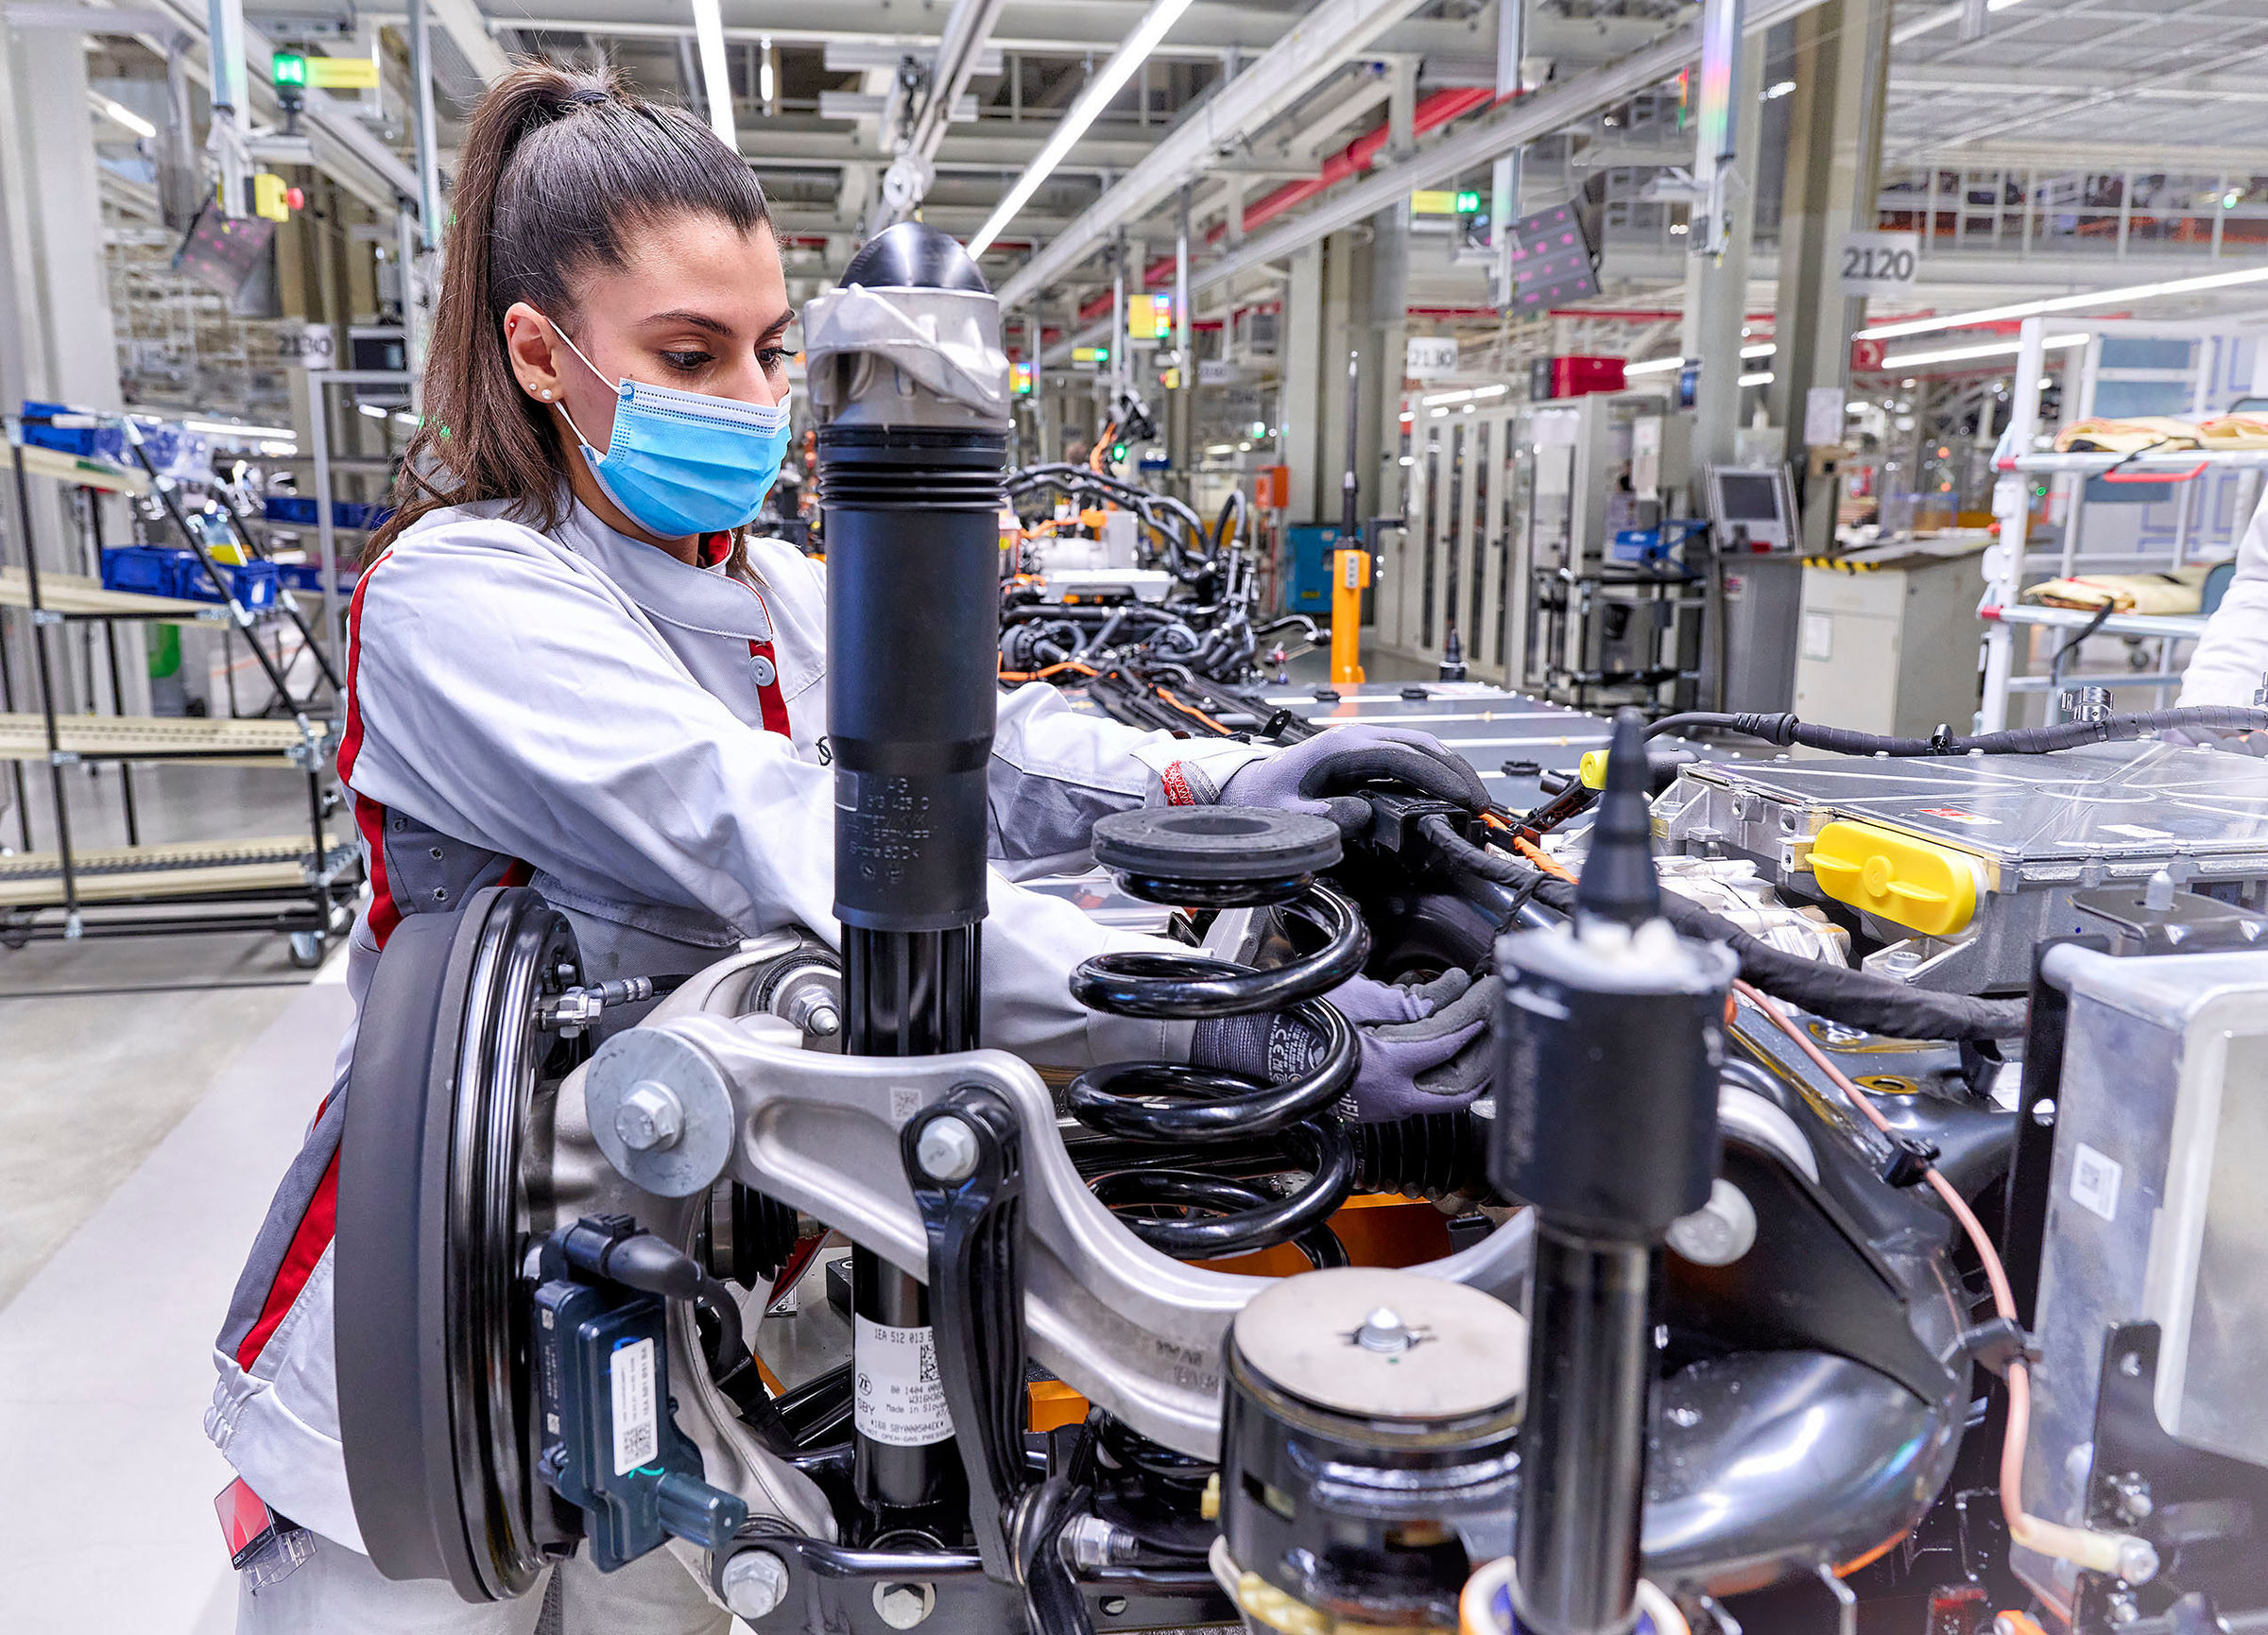 Start of production for Audi Q4 e-tron - Image 3